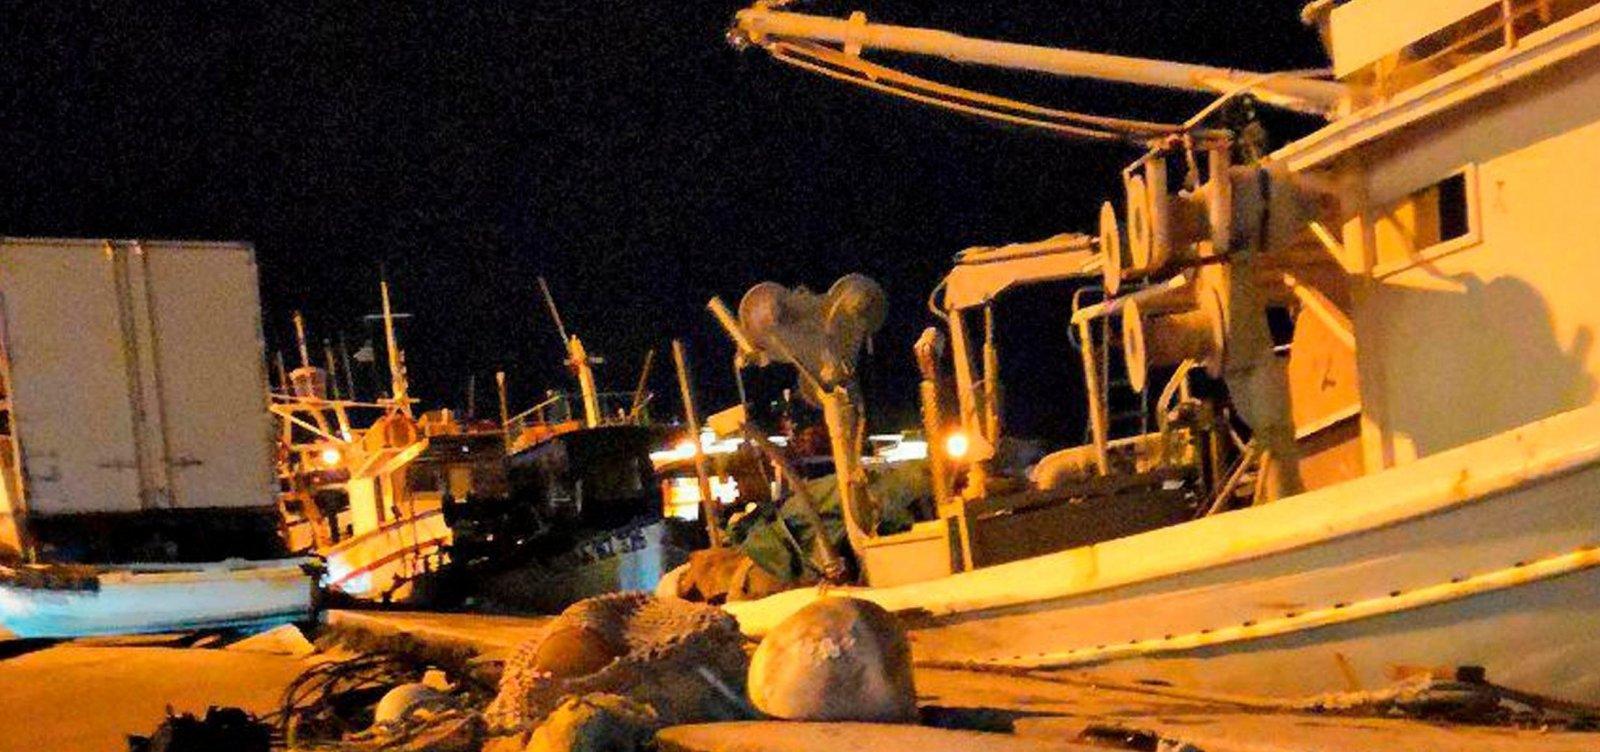 [Terremoto atinge ilha grega e provoca estragos]